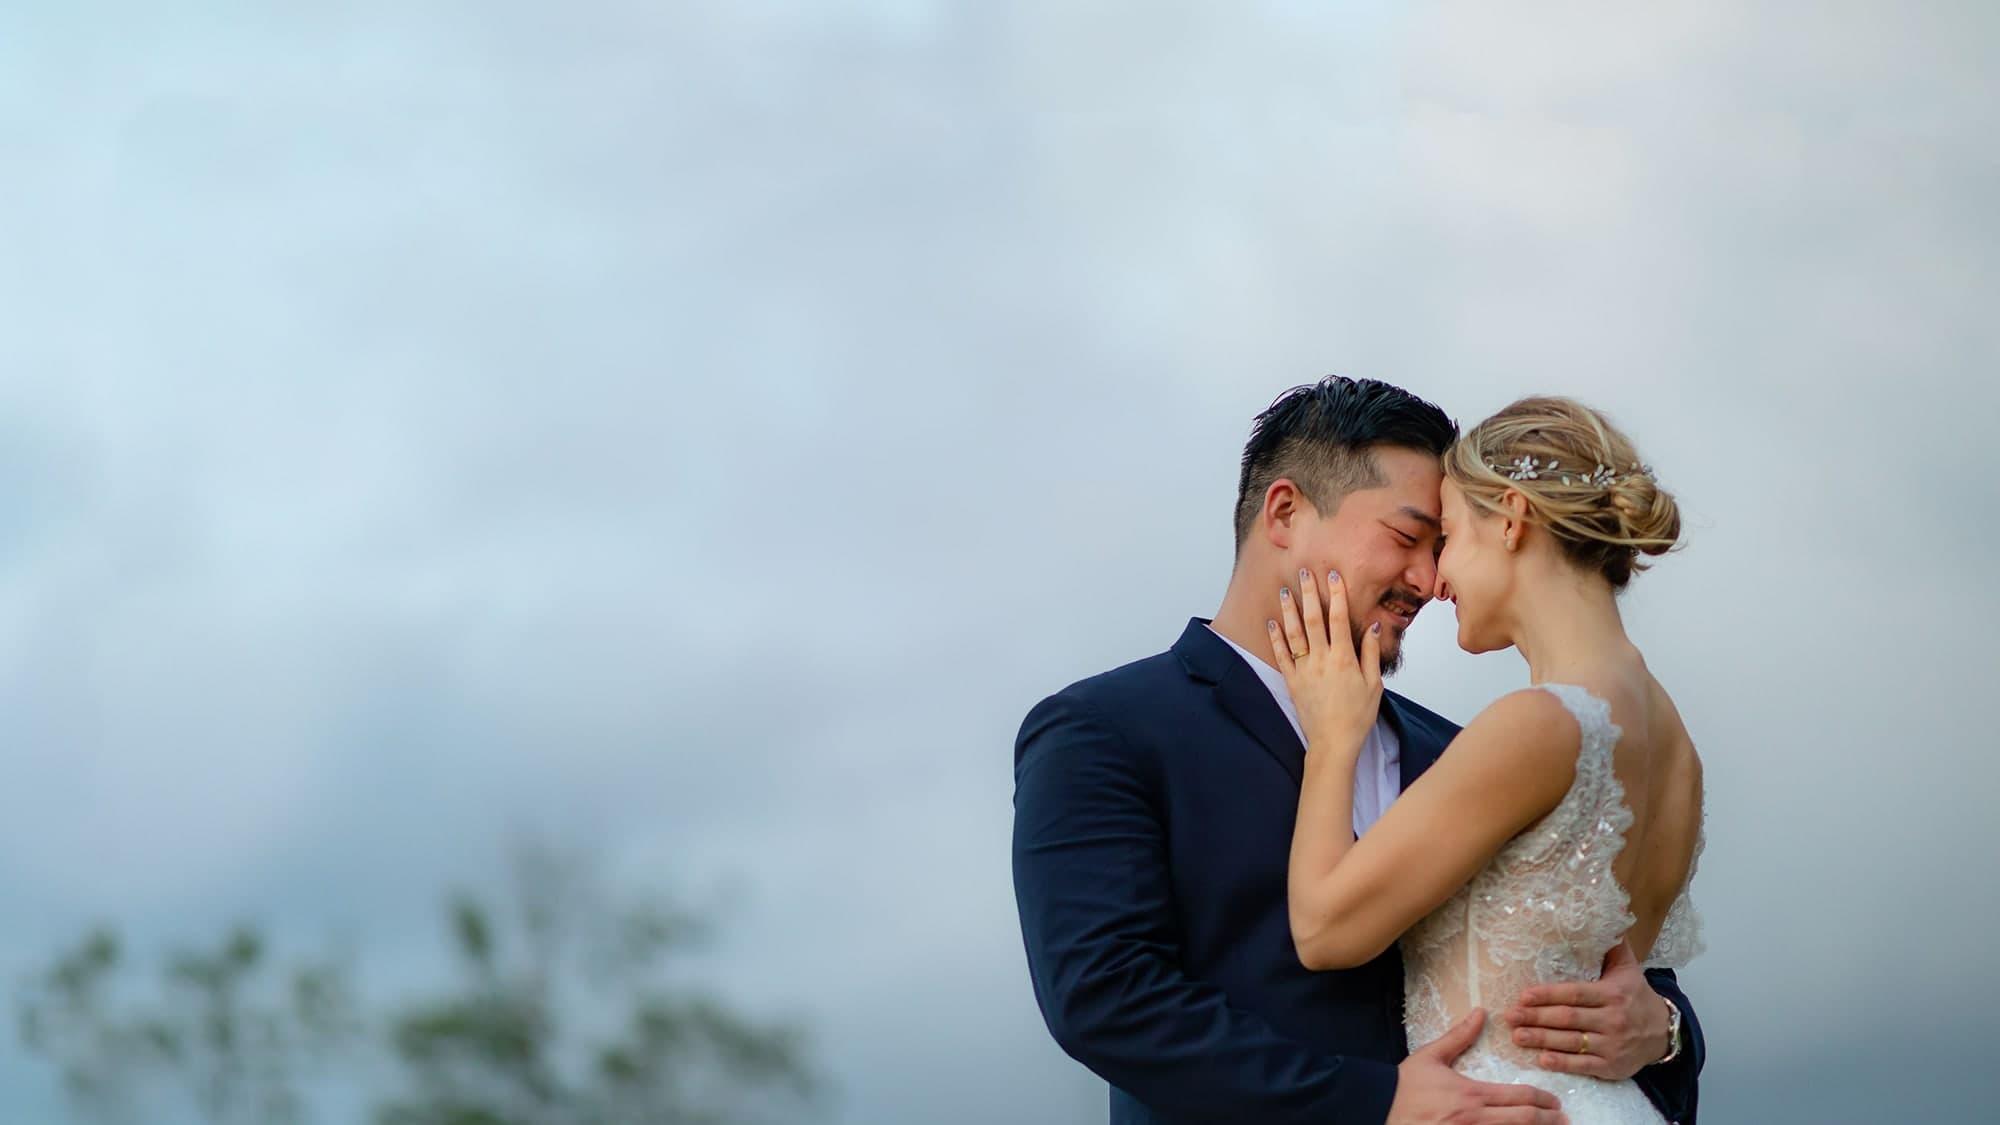 Costa Rica Wedding Photographer | Kevin Heslin Photography